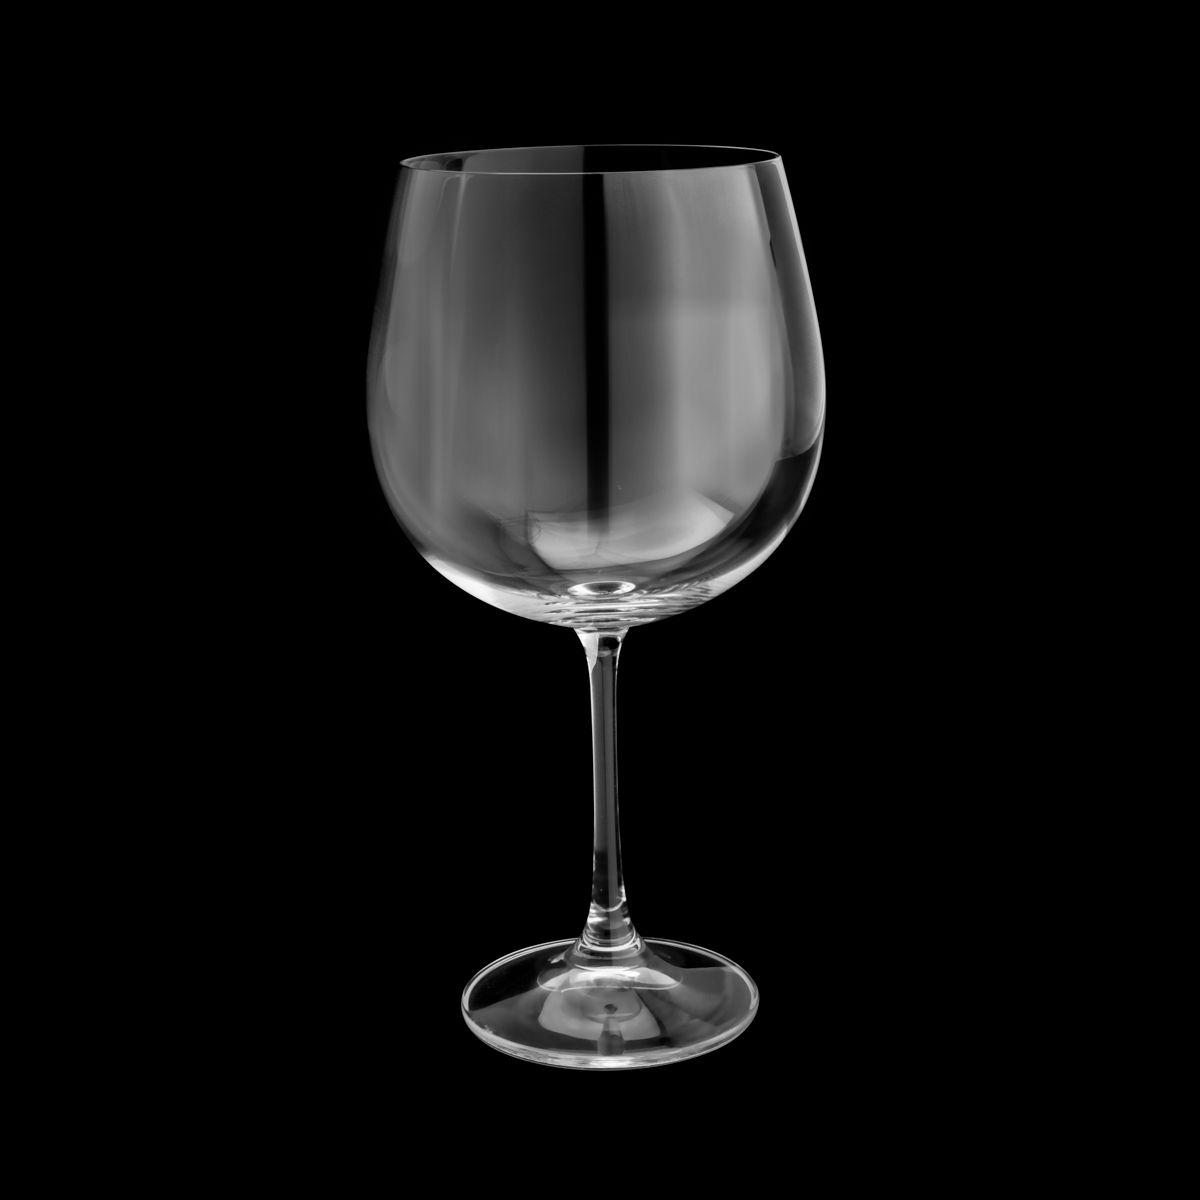 Jg 06 Taças p/ Gin Luxo 670ml de Cristal Bohemia